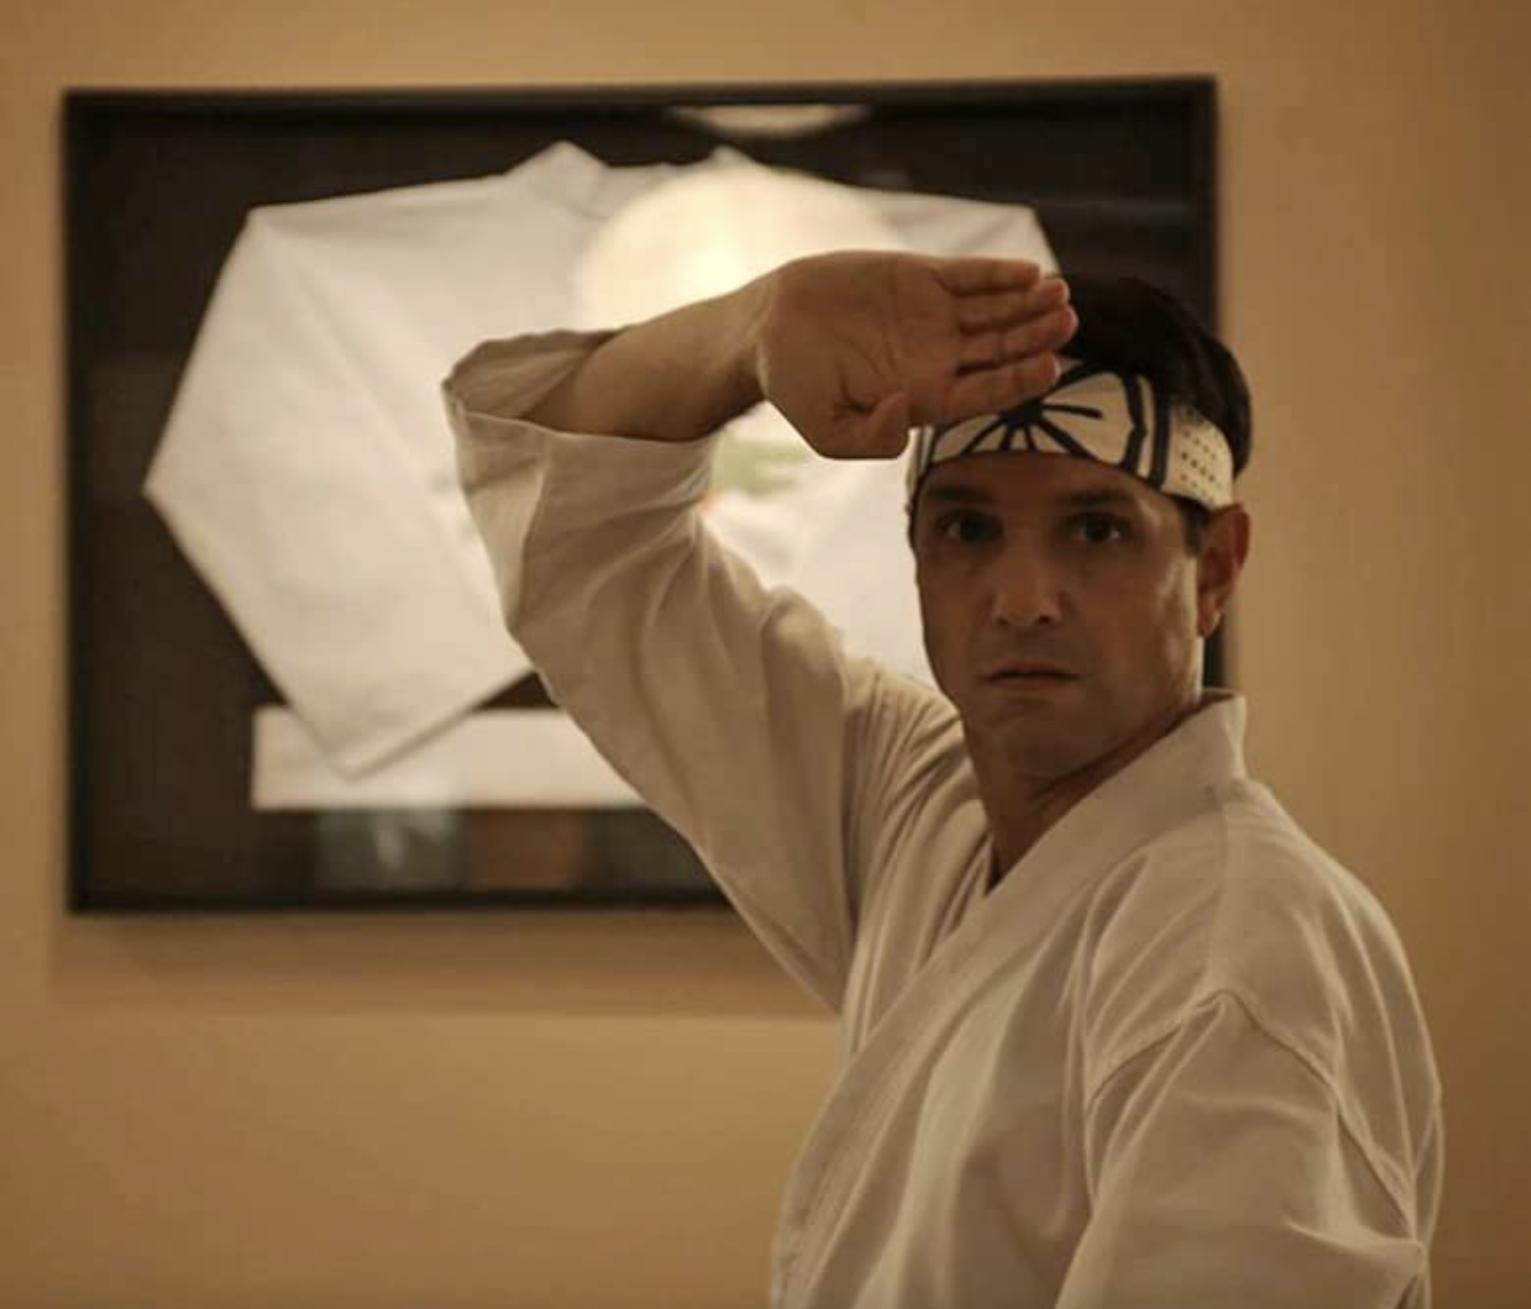 Screenshot 2021 05 06 at 09.48.49 e1620290992731 Cobra Kai Proves Daniel Was The Real Villain Of Karate Kid All Along